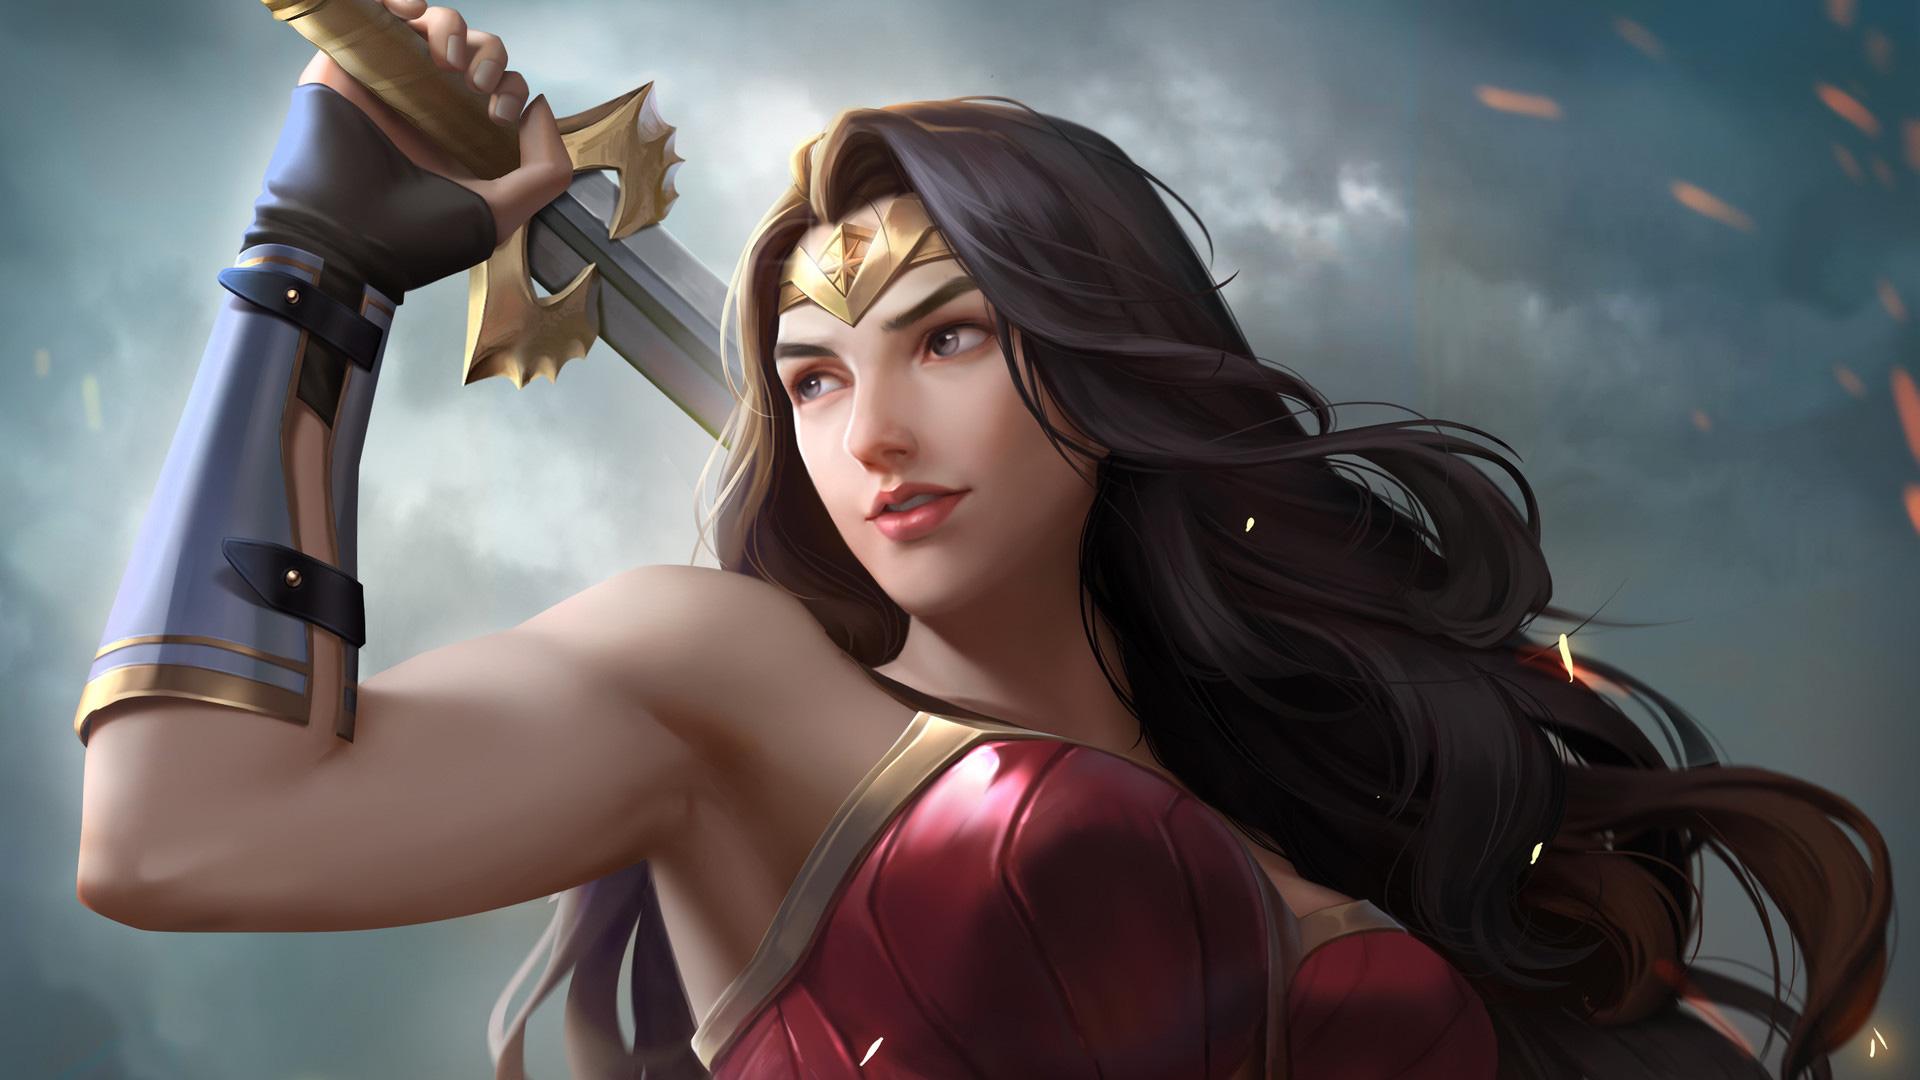 Wonder Woman Artwork 2018 Latest, HD Superheroes, 4k